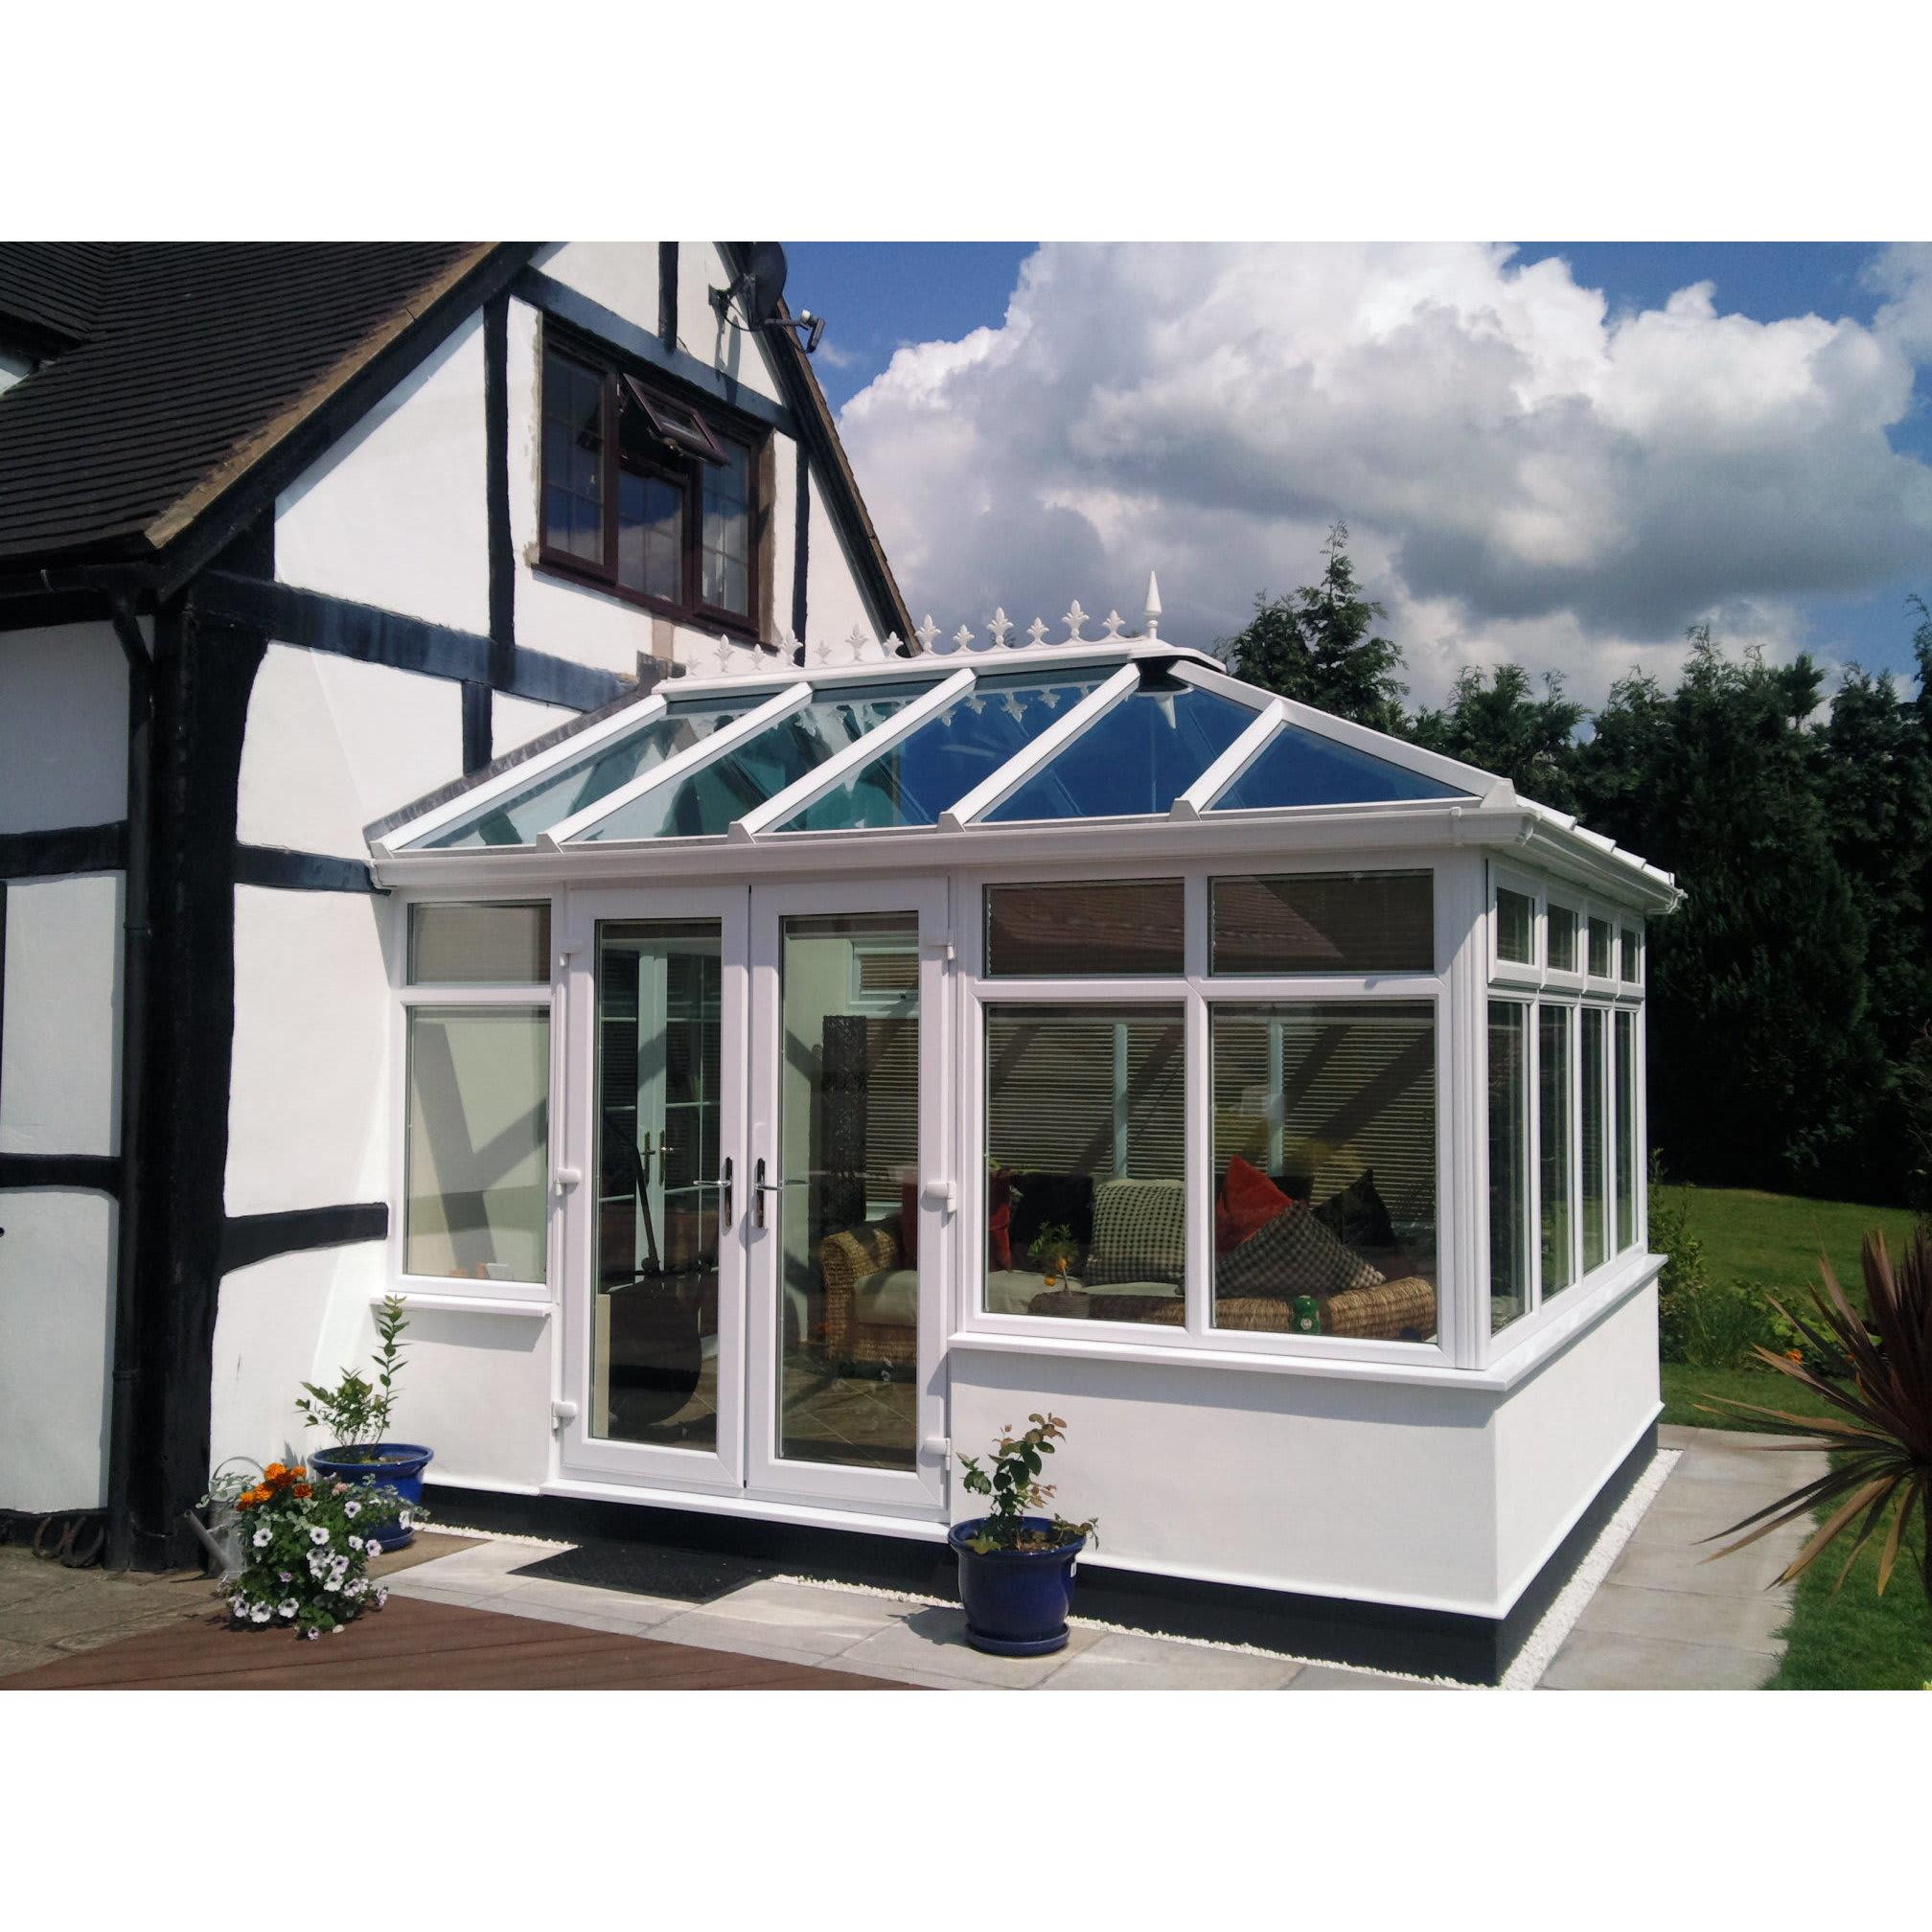 L F W Windows Ltd - Worcester, Worcestershire WR3 8TJ - 0190528493 | ShowMeLocal.com